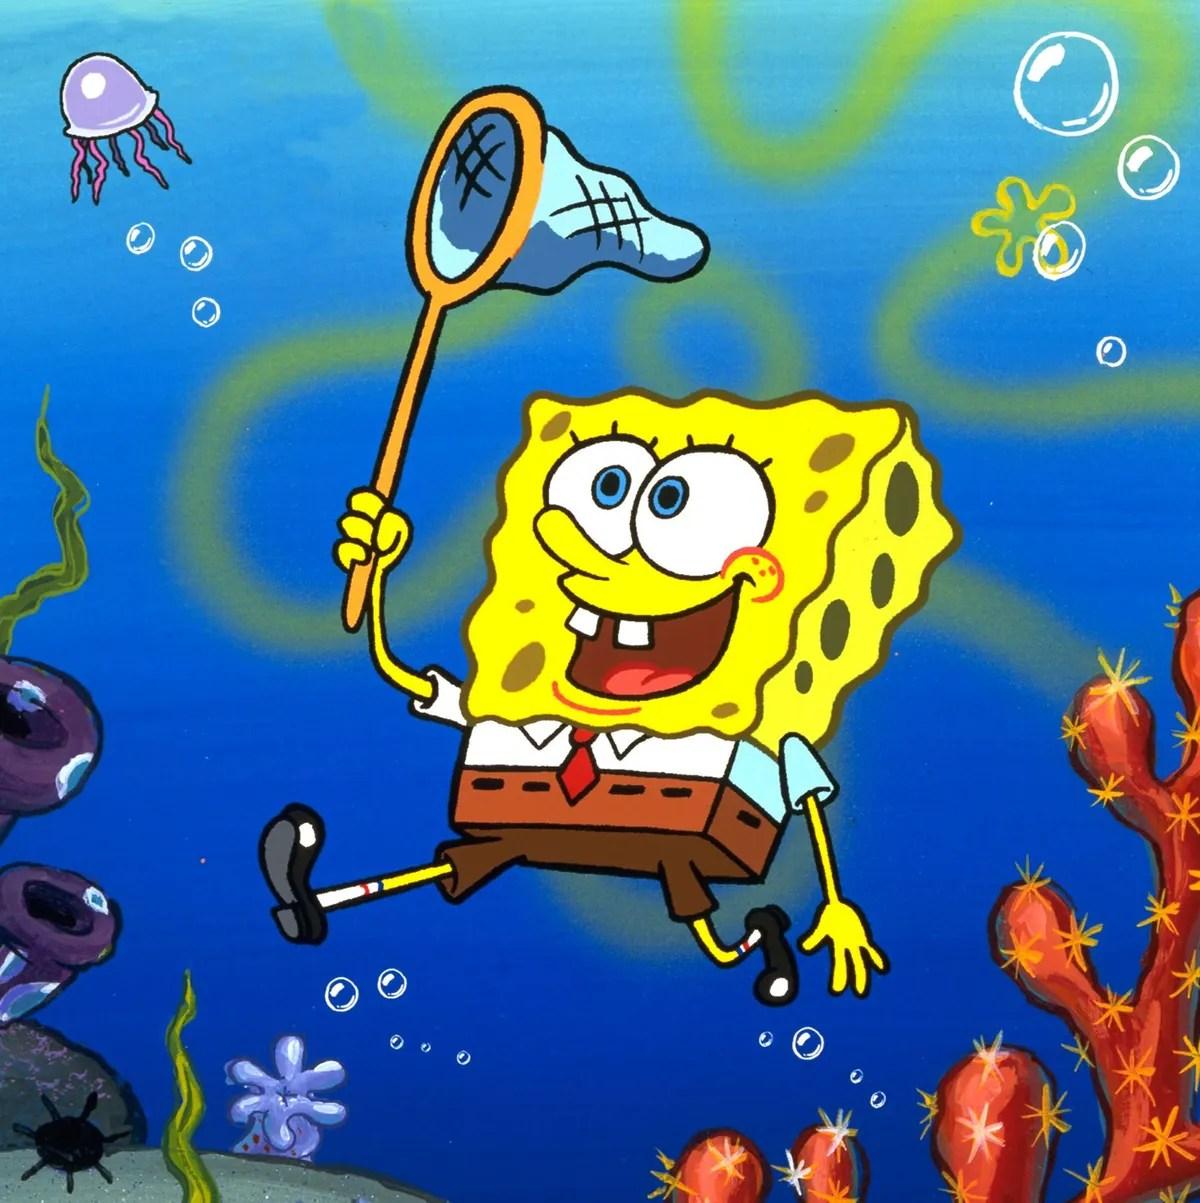 Best Spongebob Squarepants Memes Explained From Mocking Spongebob